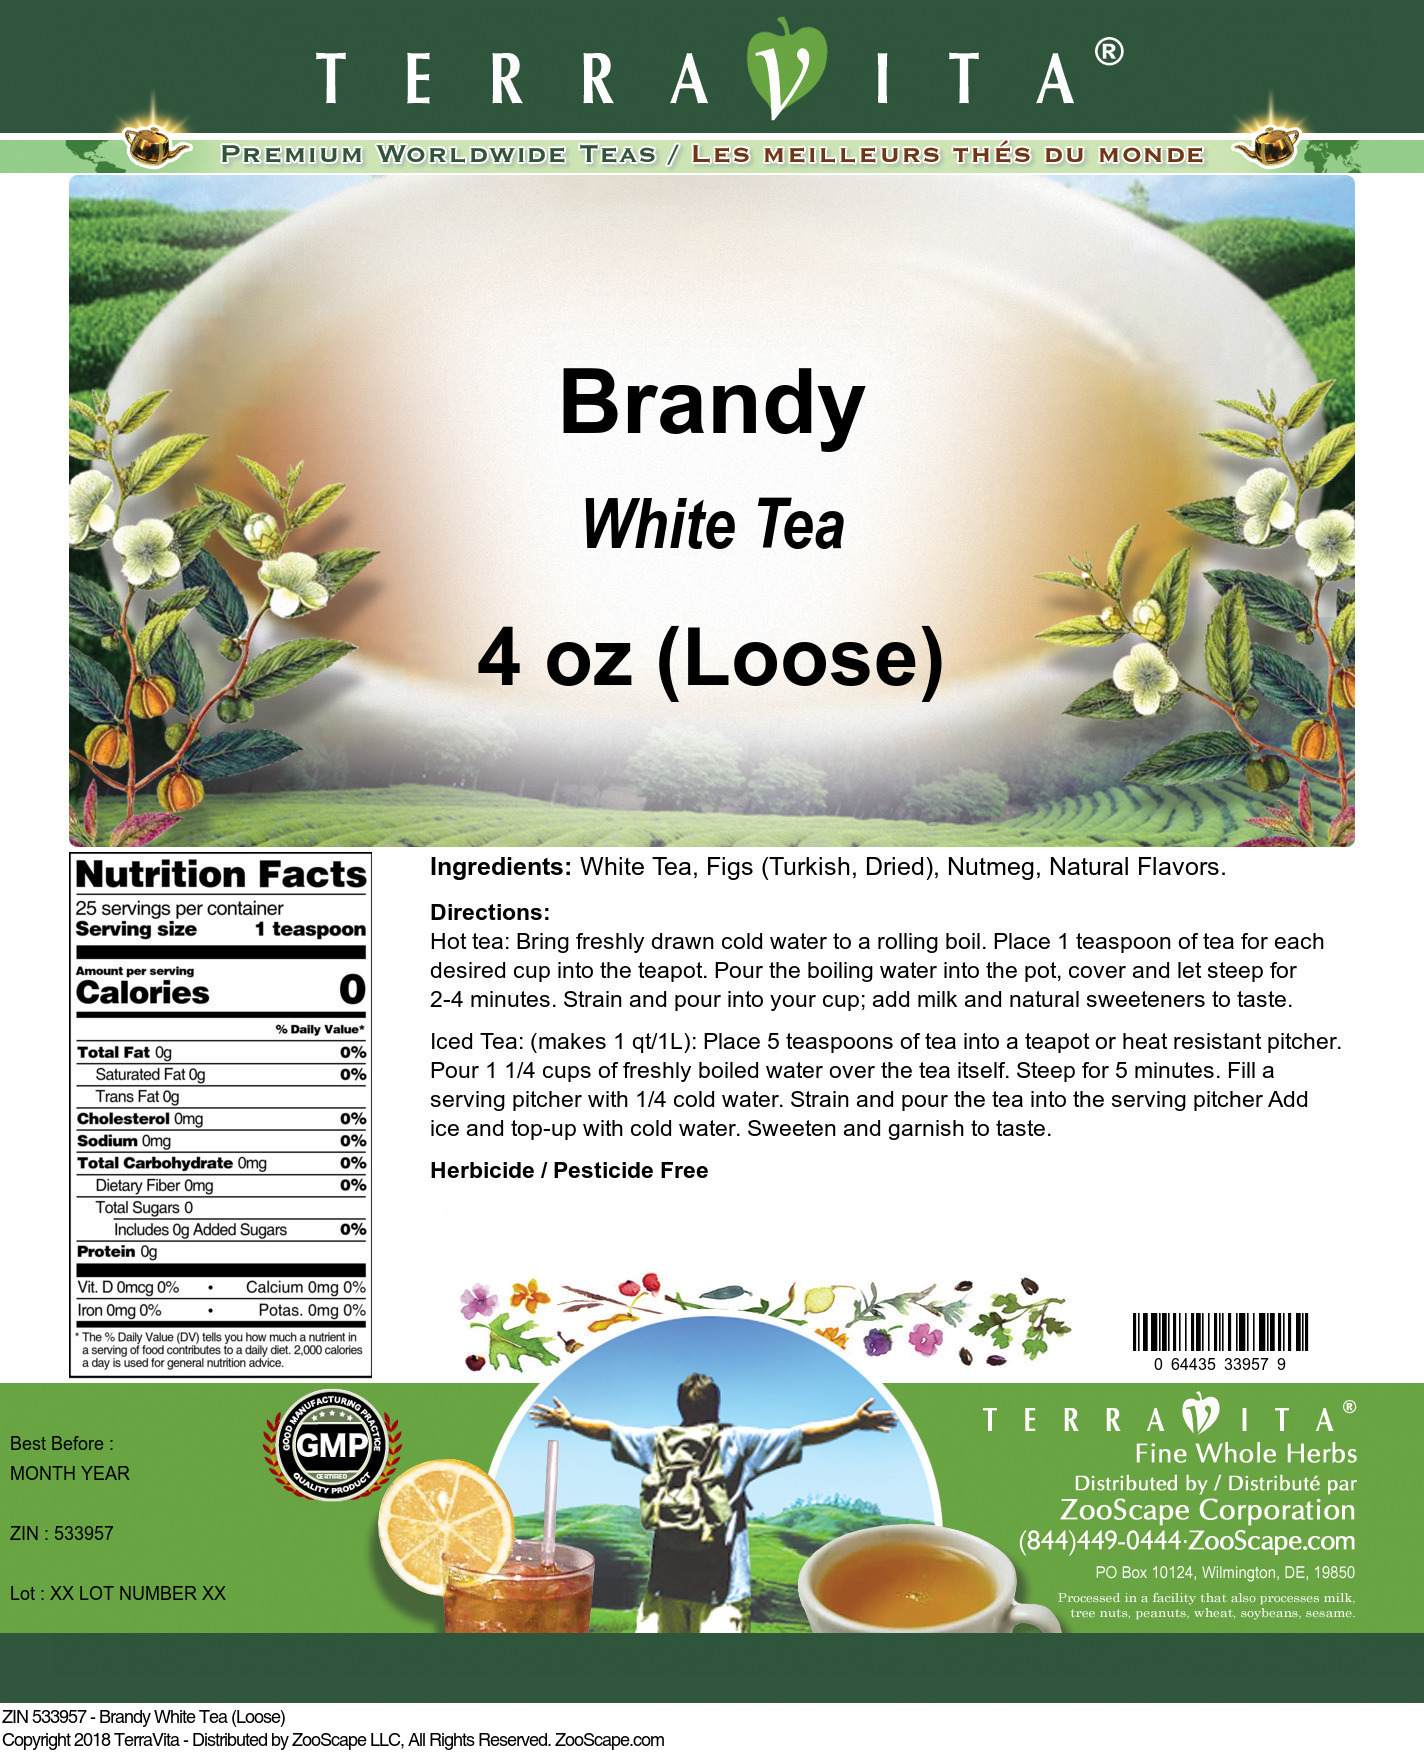 Brandy White Tea